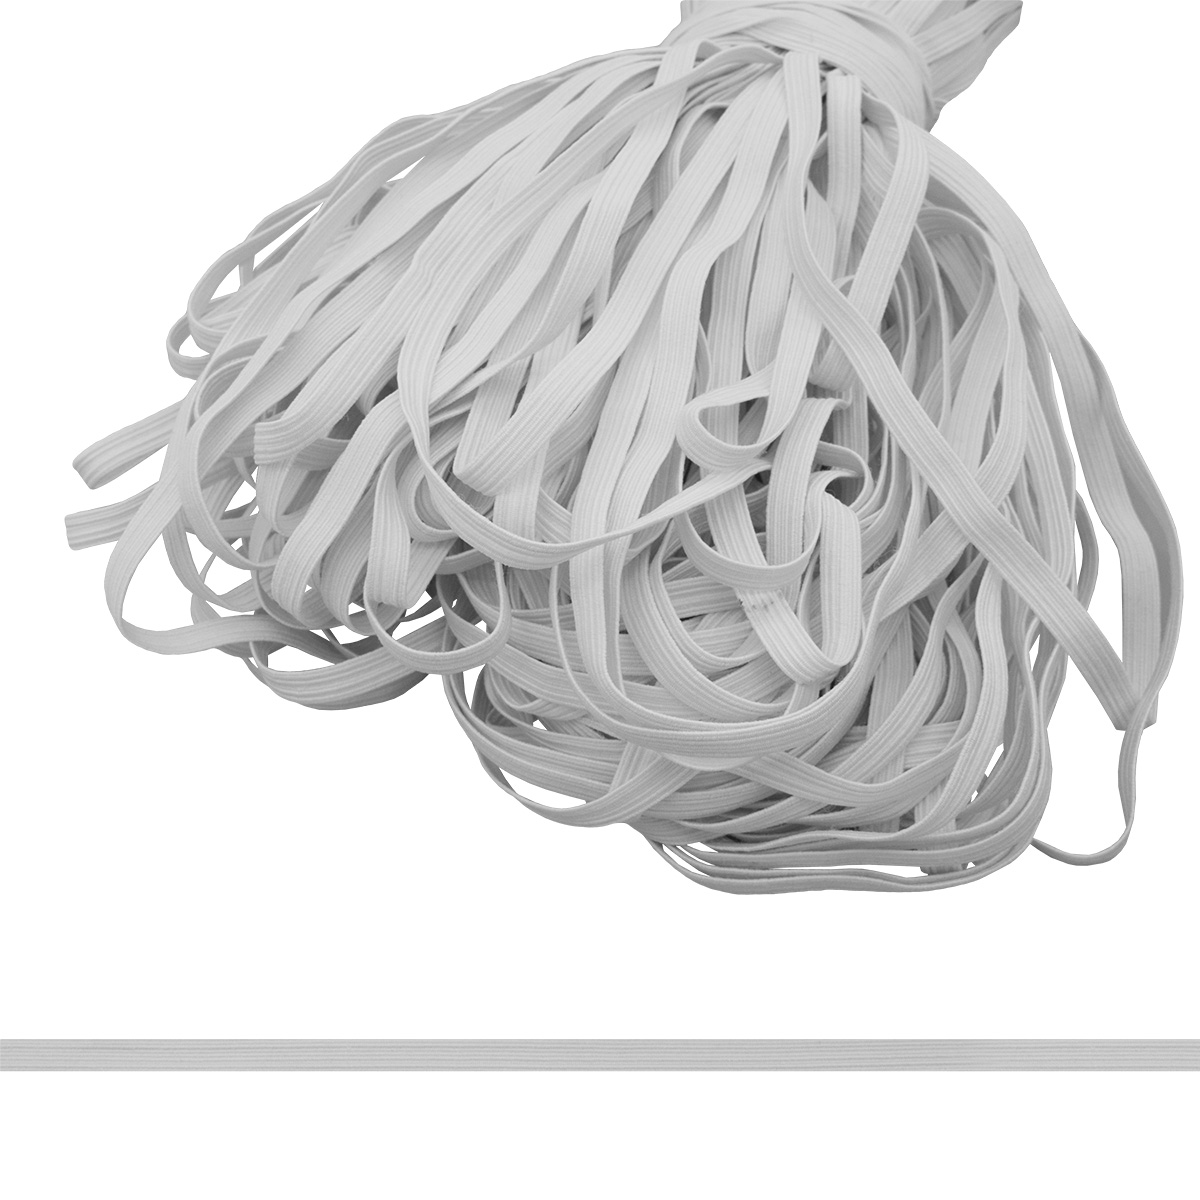 Тесьма эластичная, 7 мм*100 м, белый